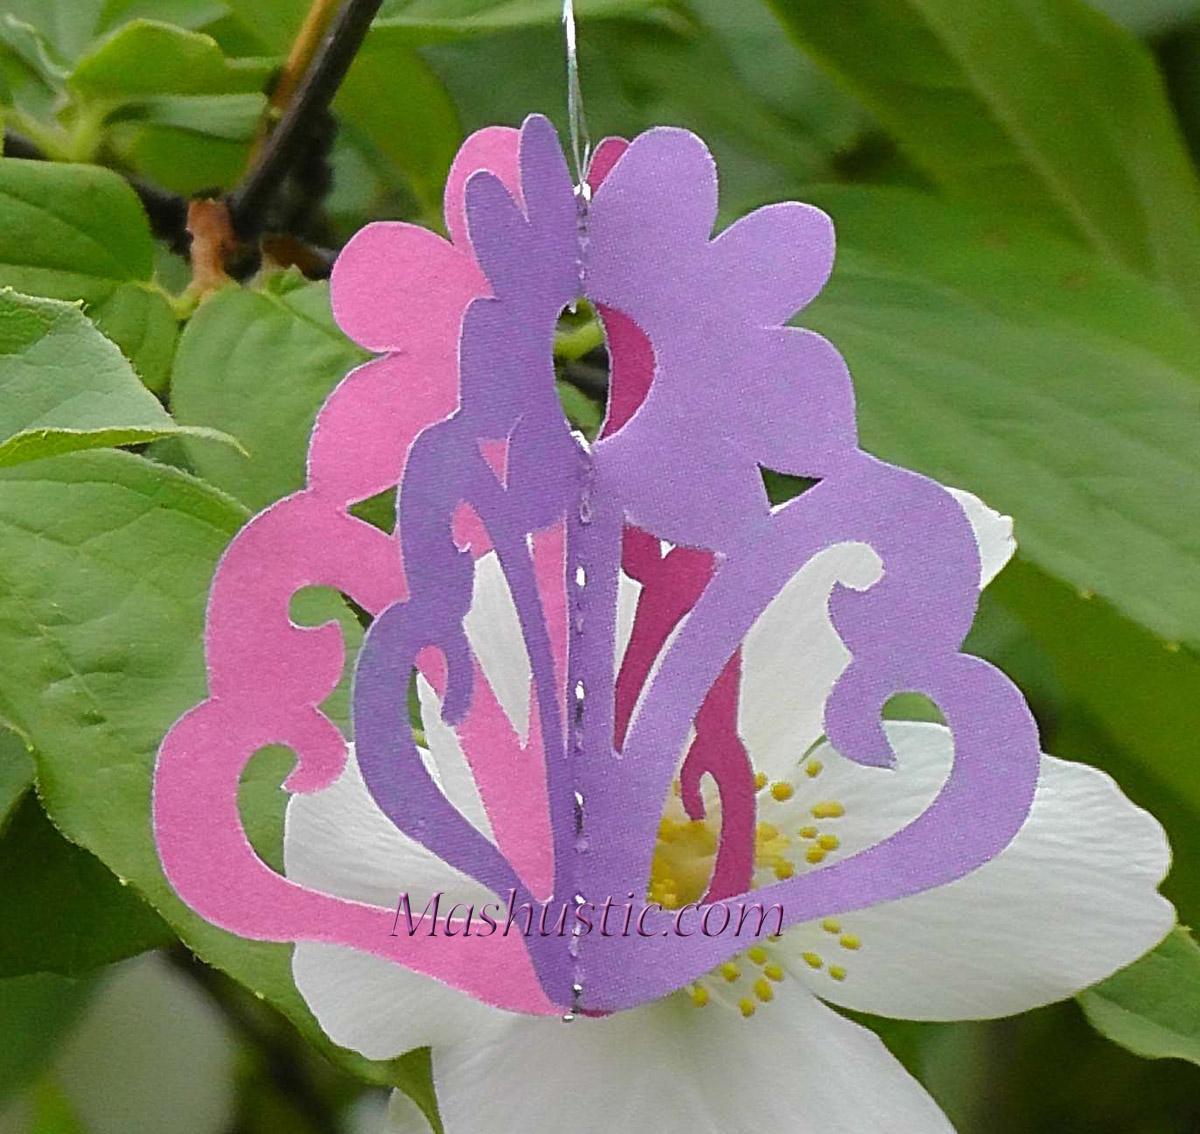 Paper Cutting Flowers Mashustic